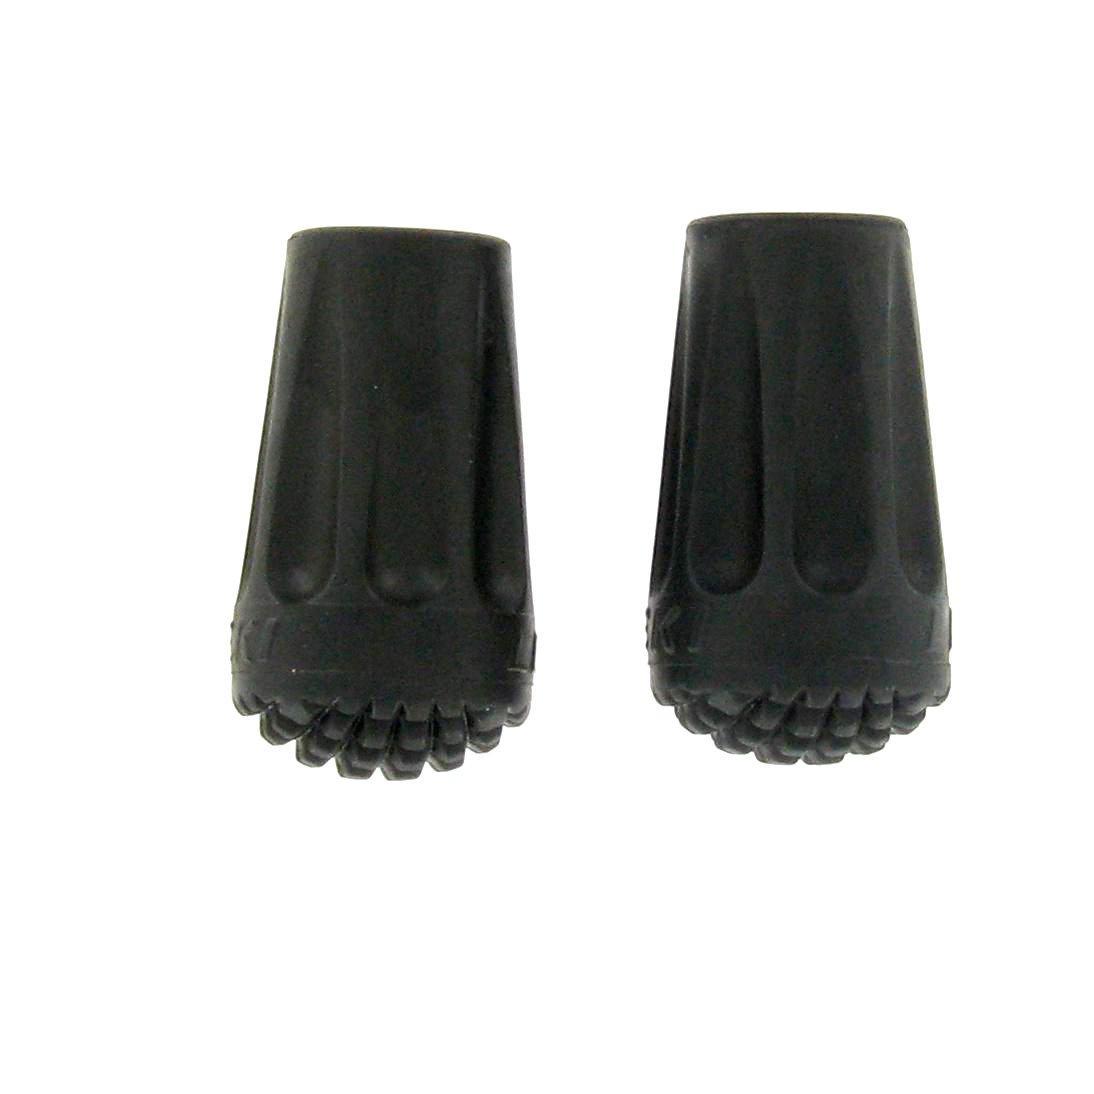 Leki 2 Pack Rubber Walking Pole Tips - Black/asso  Black/asso